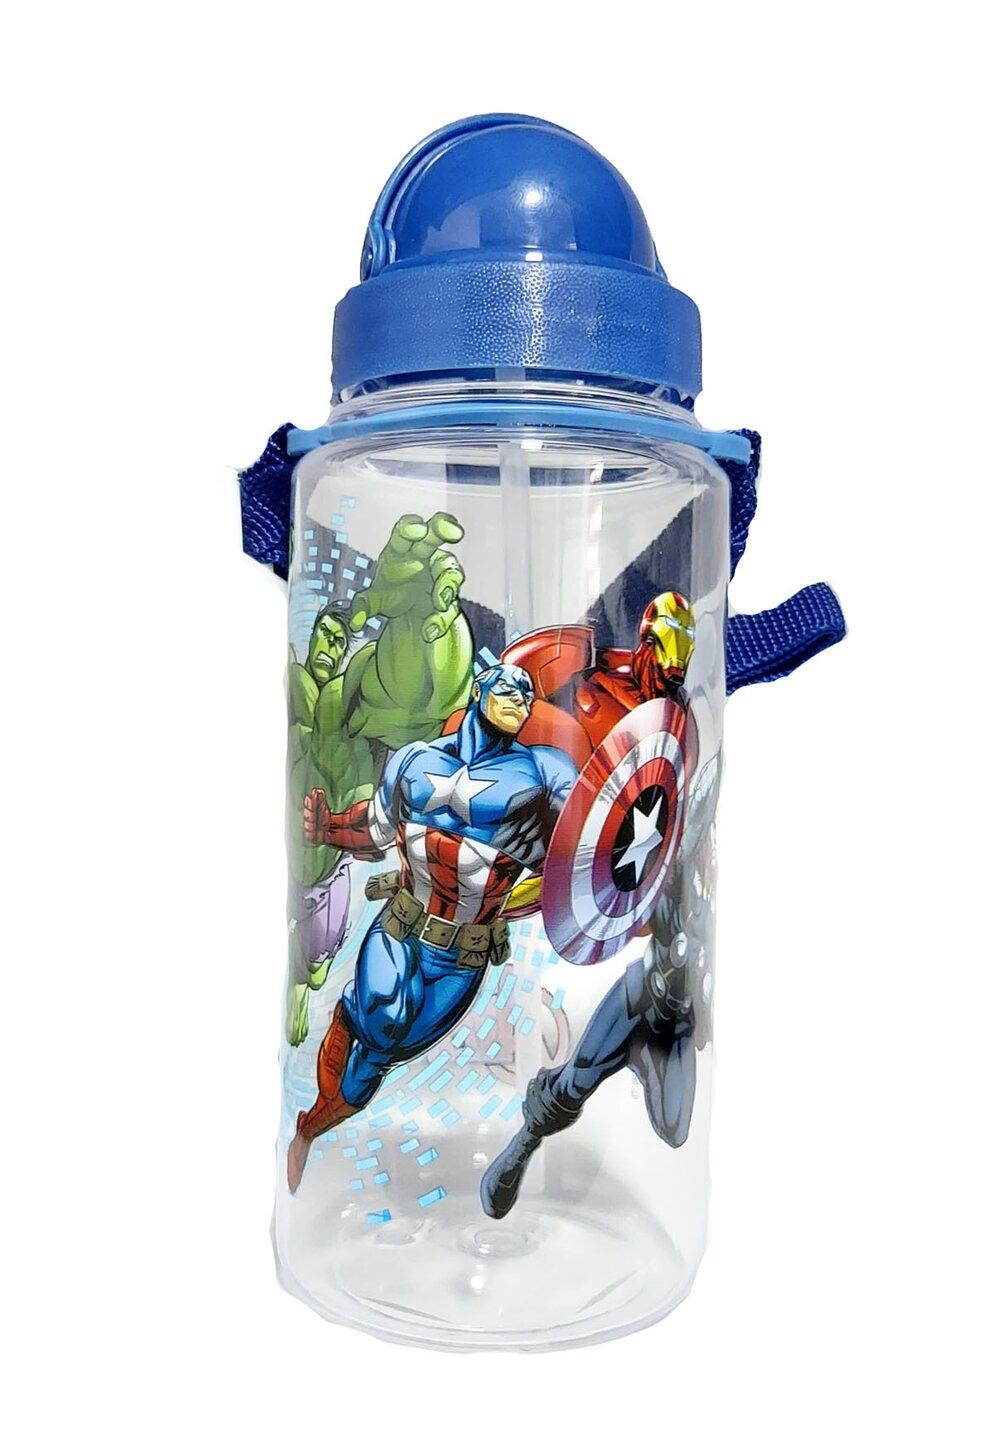 Sticla cu pai, Avengers, bluemarin imagine